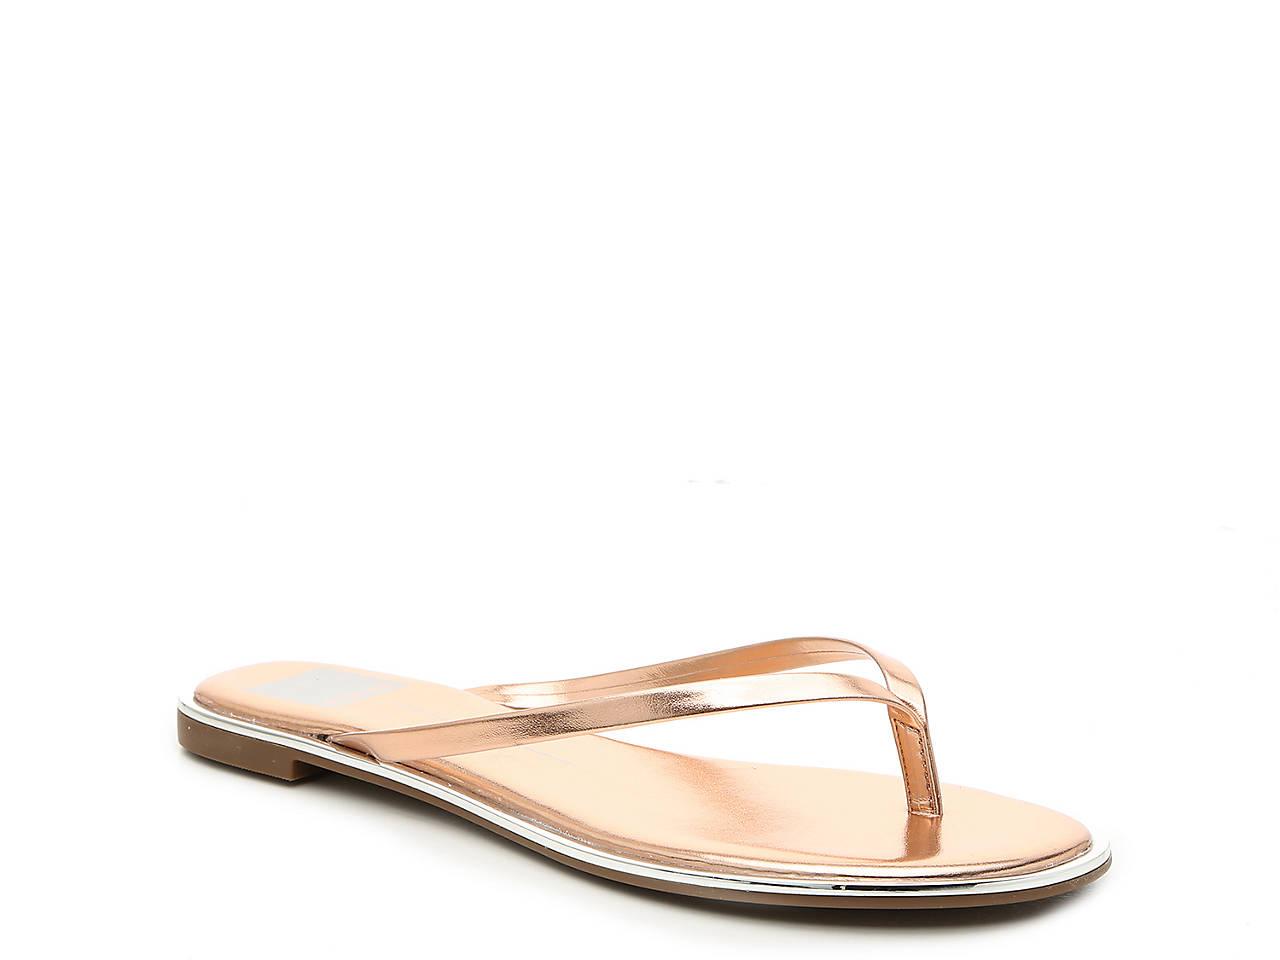 e5afb5259f44 Dolce Vita Dawn Flip Flop Women s Shoes